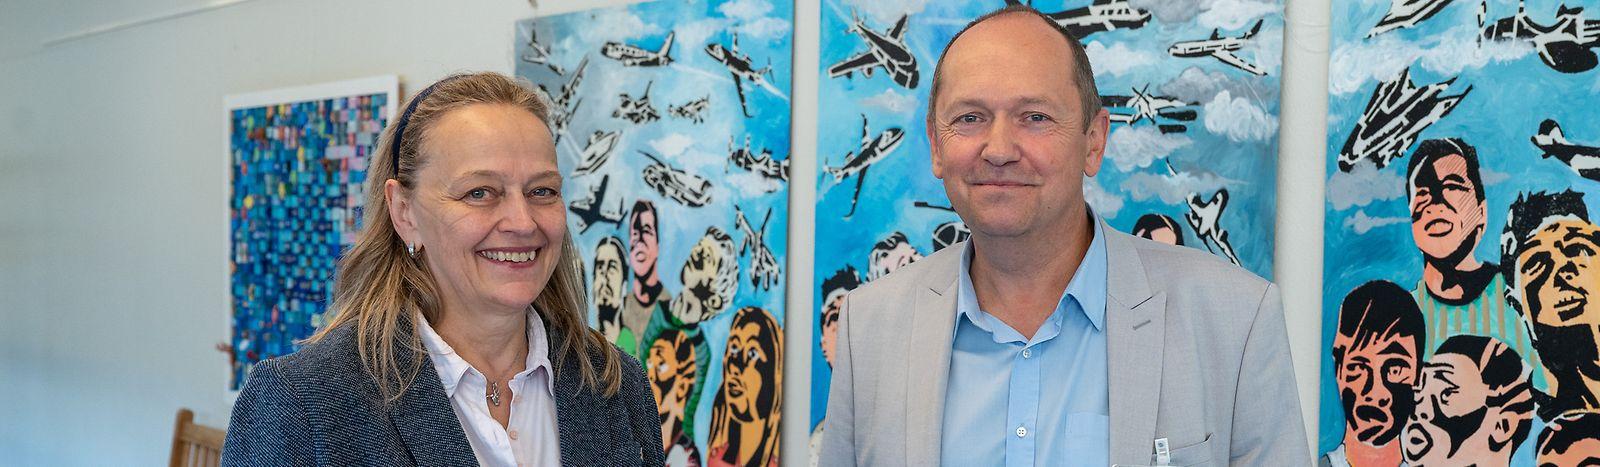 Julie-Suzanne Bausch diretora da Escola Internacional Mersch Anne Beffort e Michel Hiebel do SOIE.